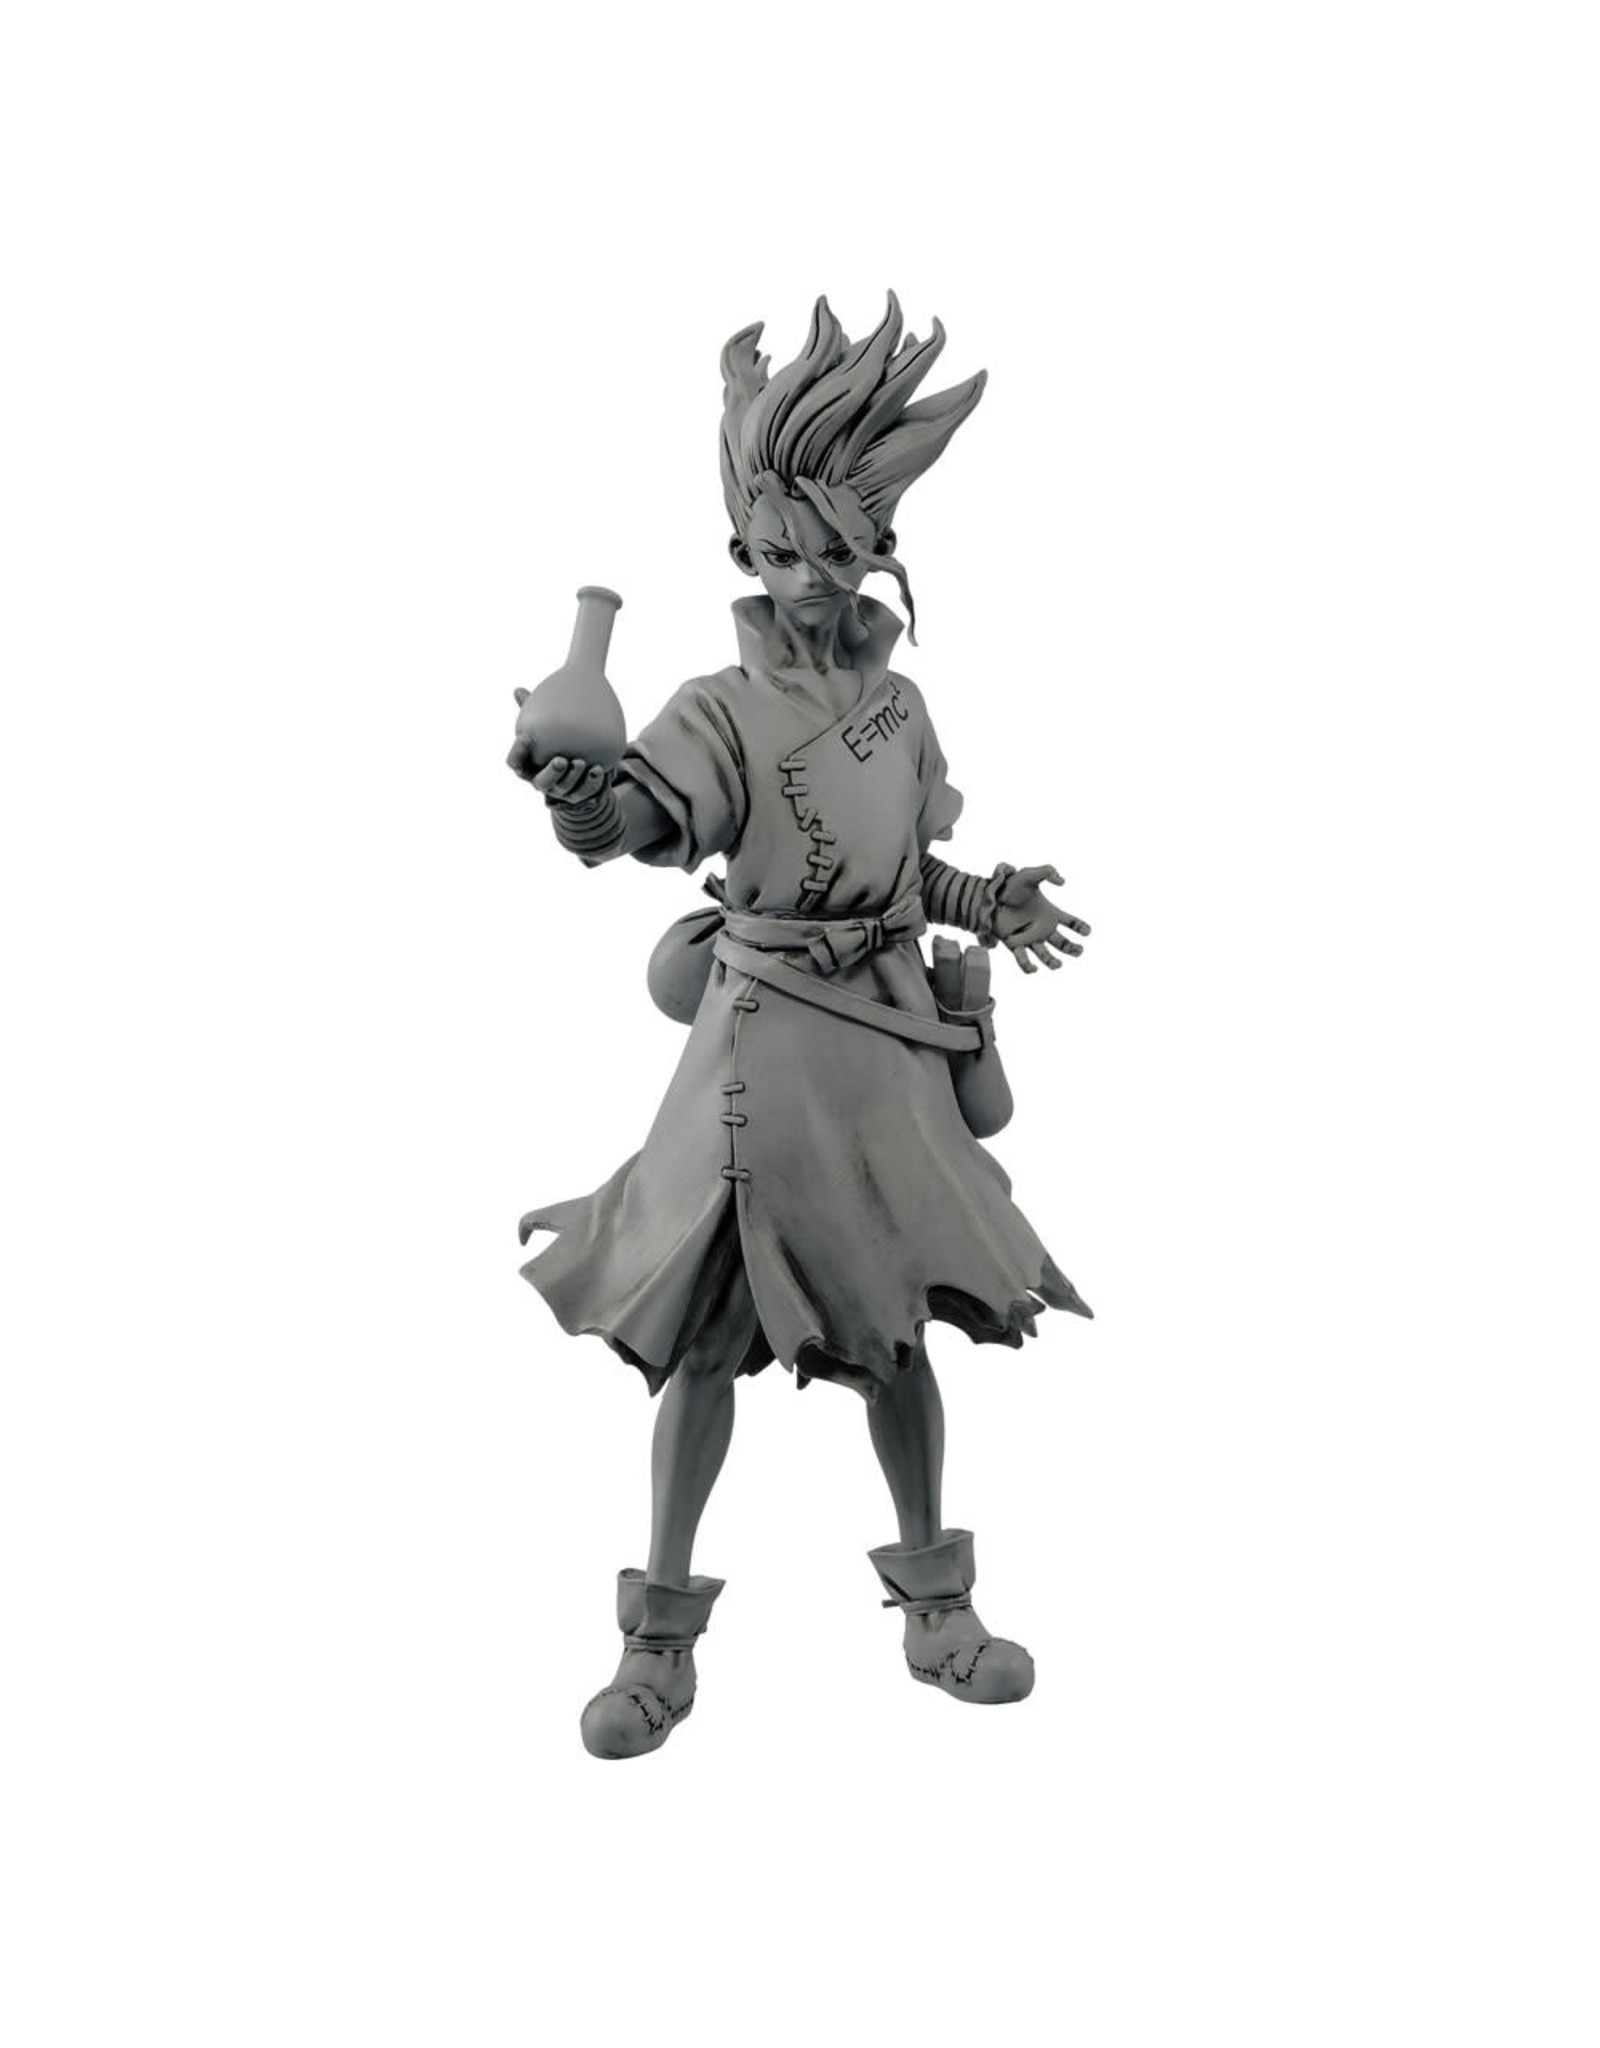 Dr. Stone - Stone World Senku Ishigami - PVC Statue - 18 cm